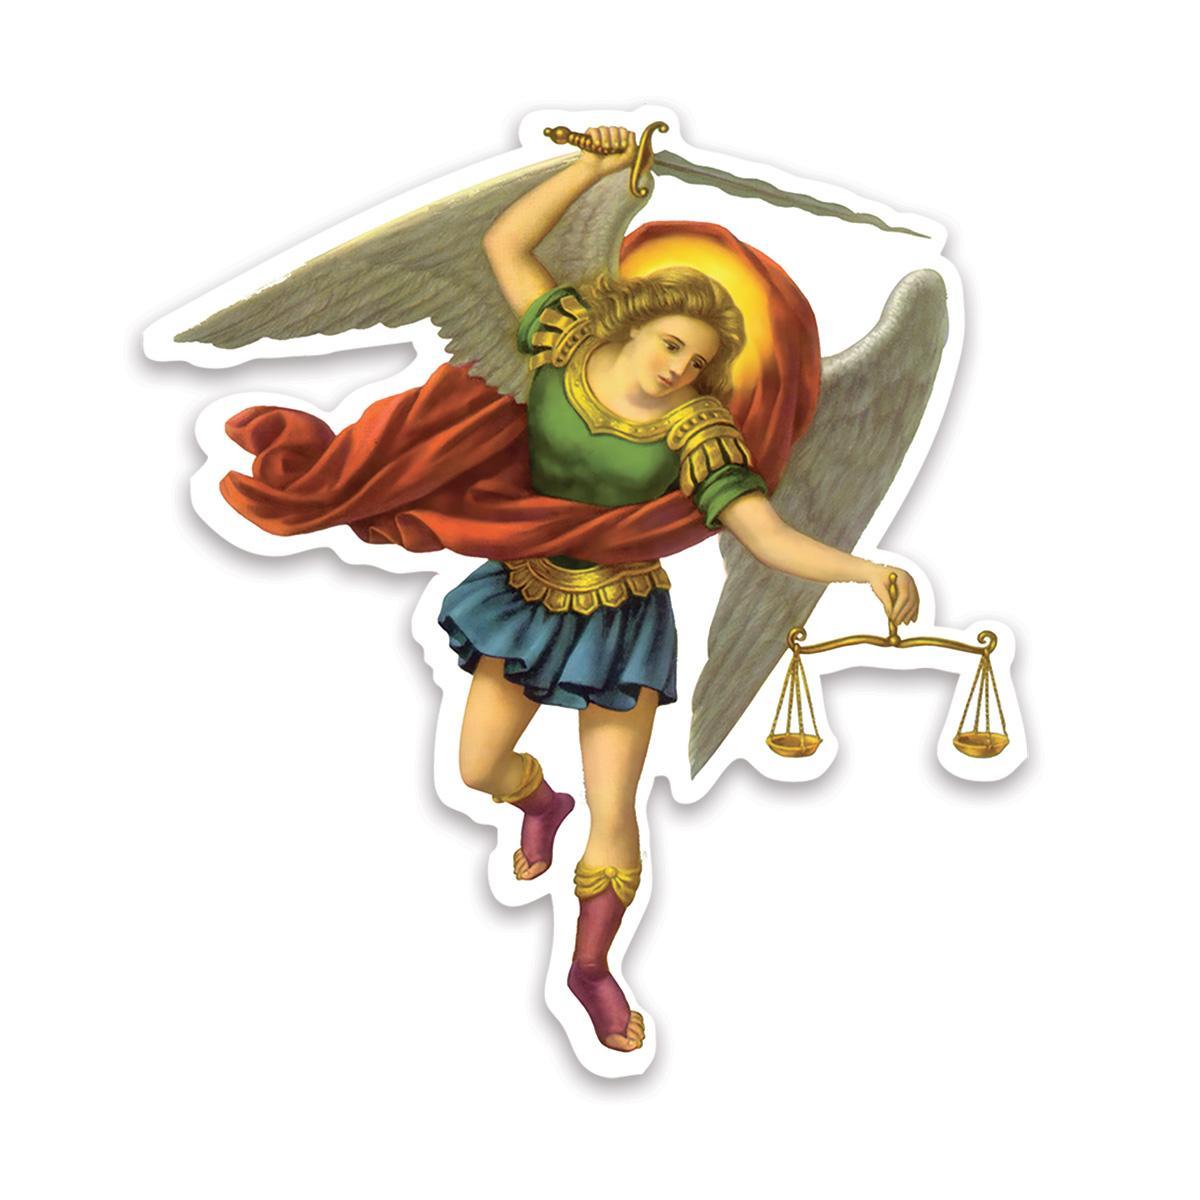 St Michael The Archangel : Gift Sticker Angel Catholic Religious Saint